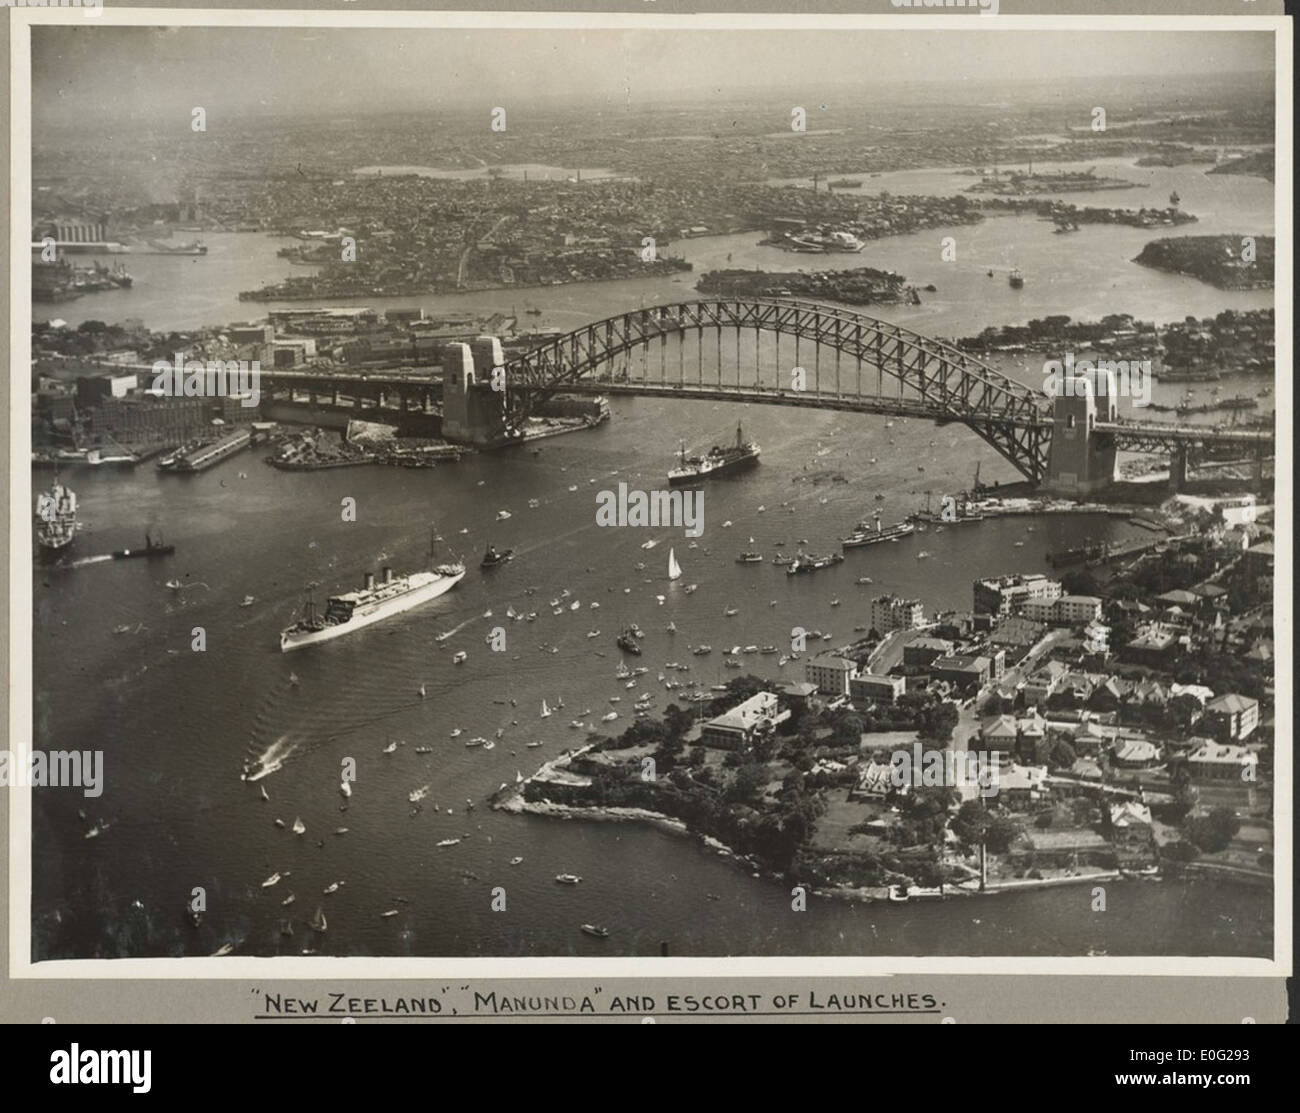 The ships New Zeeland and Manunda passing under Sydney Harbour Bridge, 19 March 1932 - Stock Image